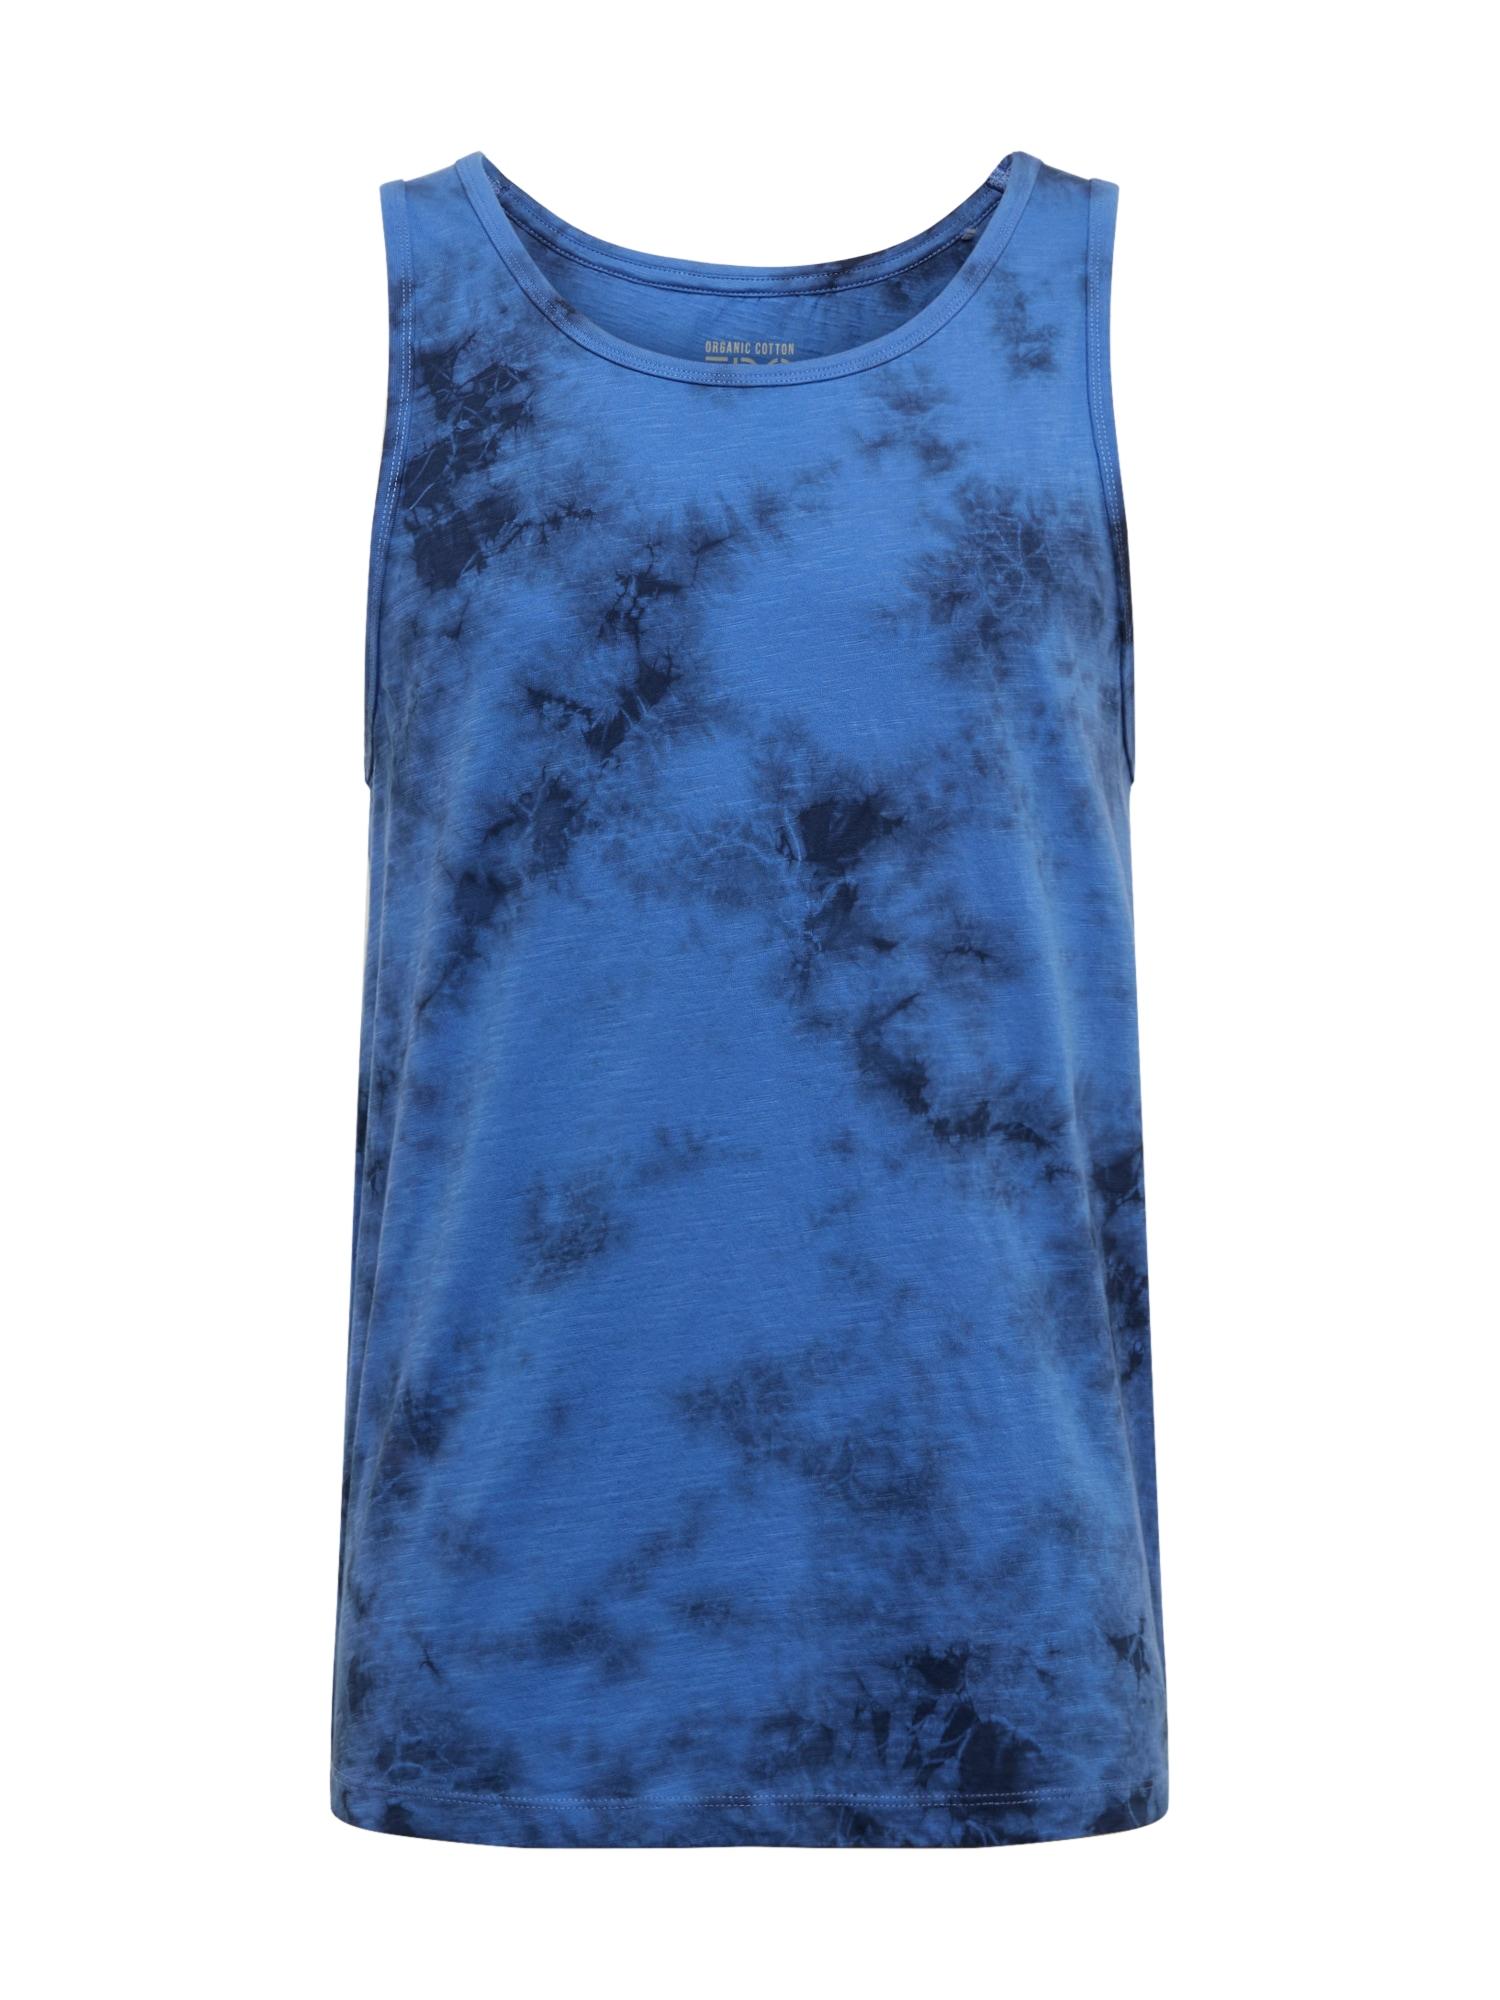 EDC BY ESPRIT Marškinėliai 'OCS slb dye tan' šviesiai mėlyna